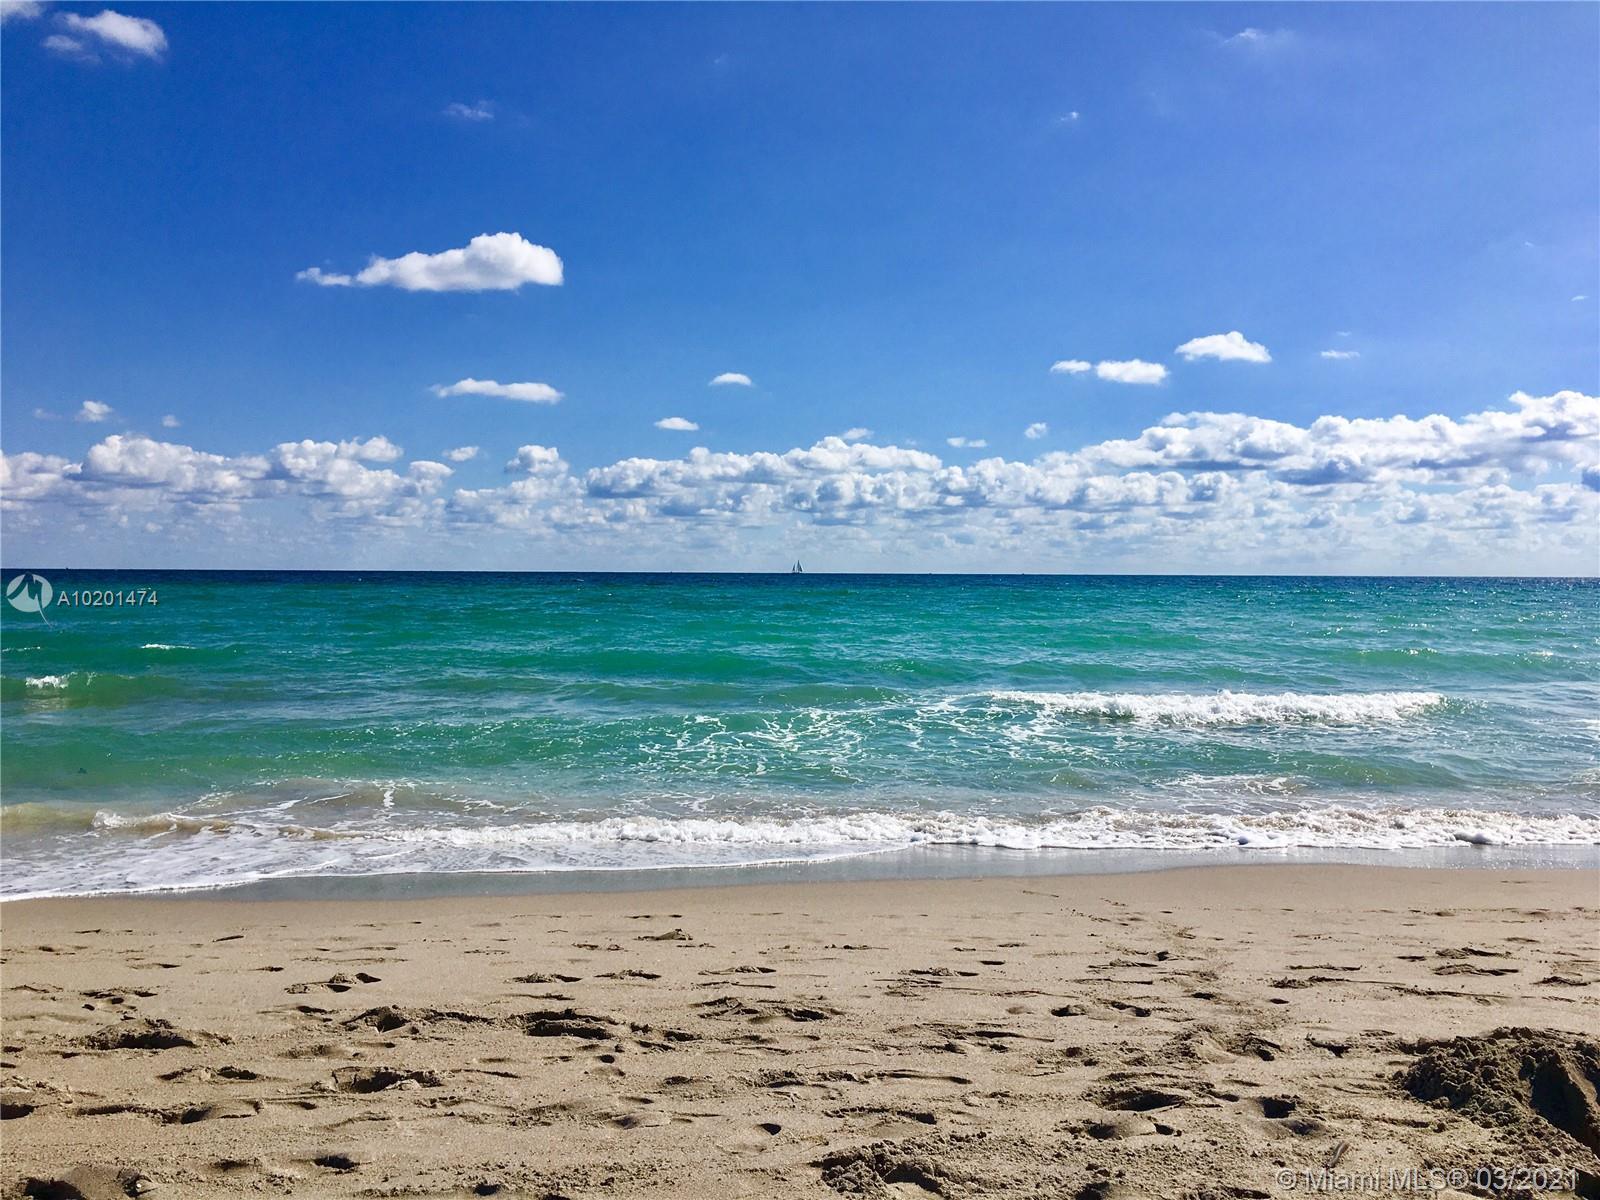 495 Ocean Blvd, Golden Beach FL 33160 - Photo 1